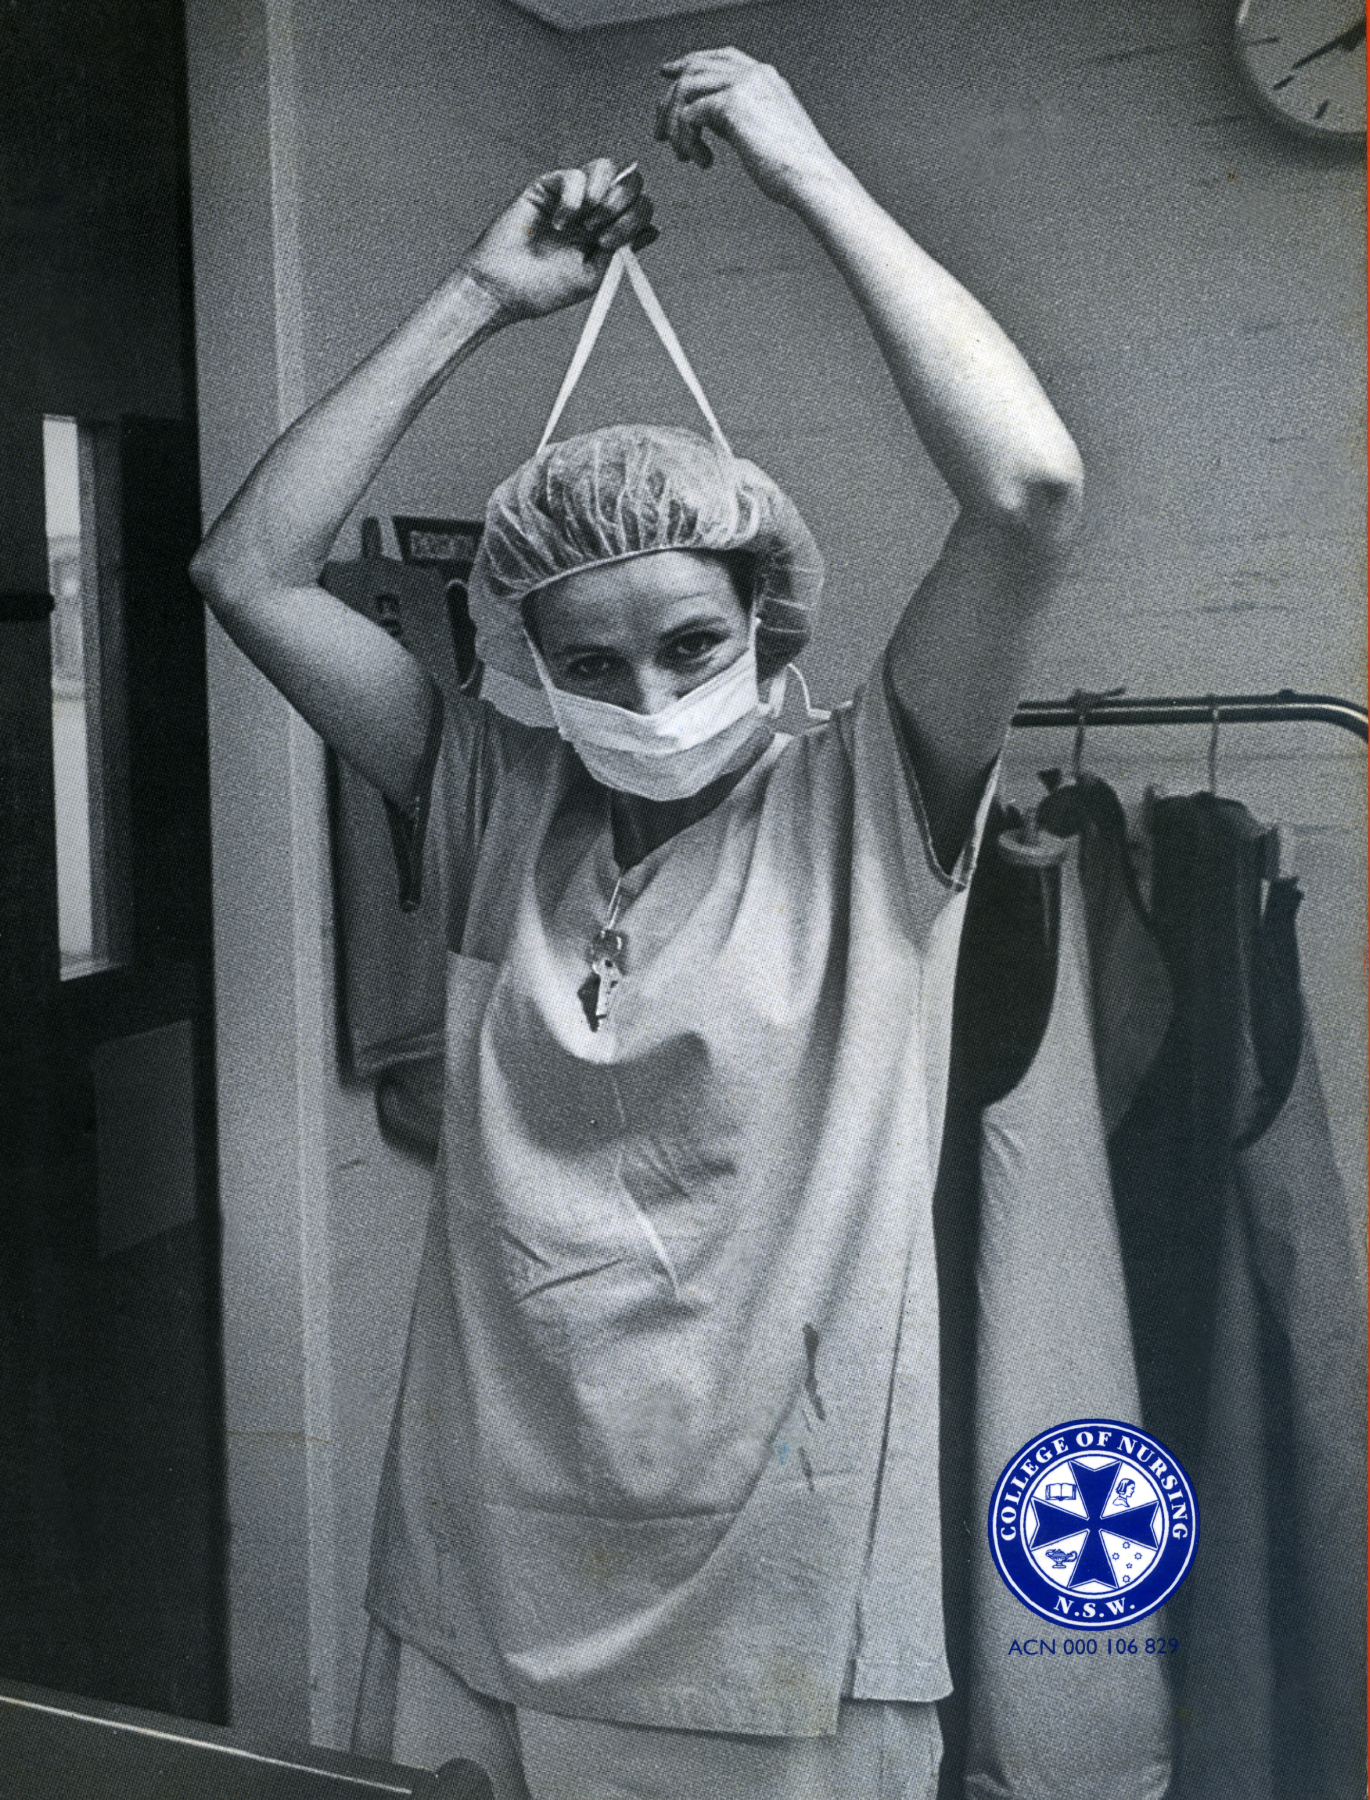 JackPicone_NursingColl_1997-1.JPG